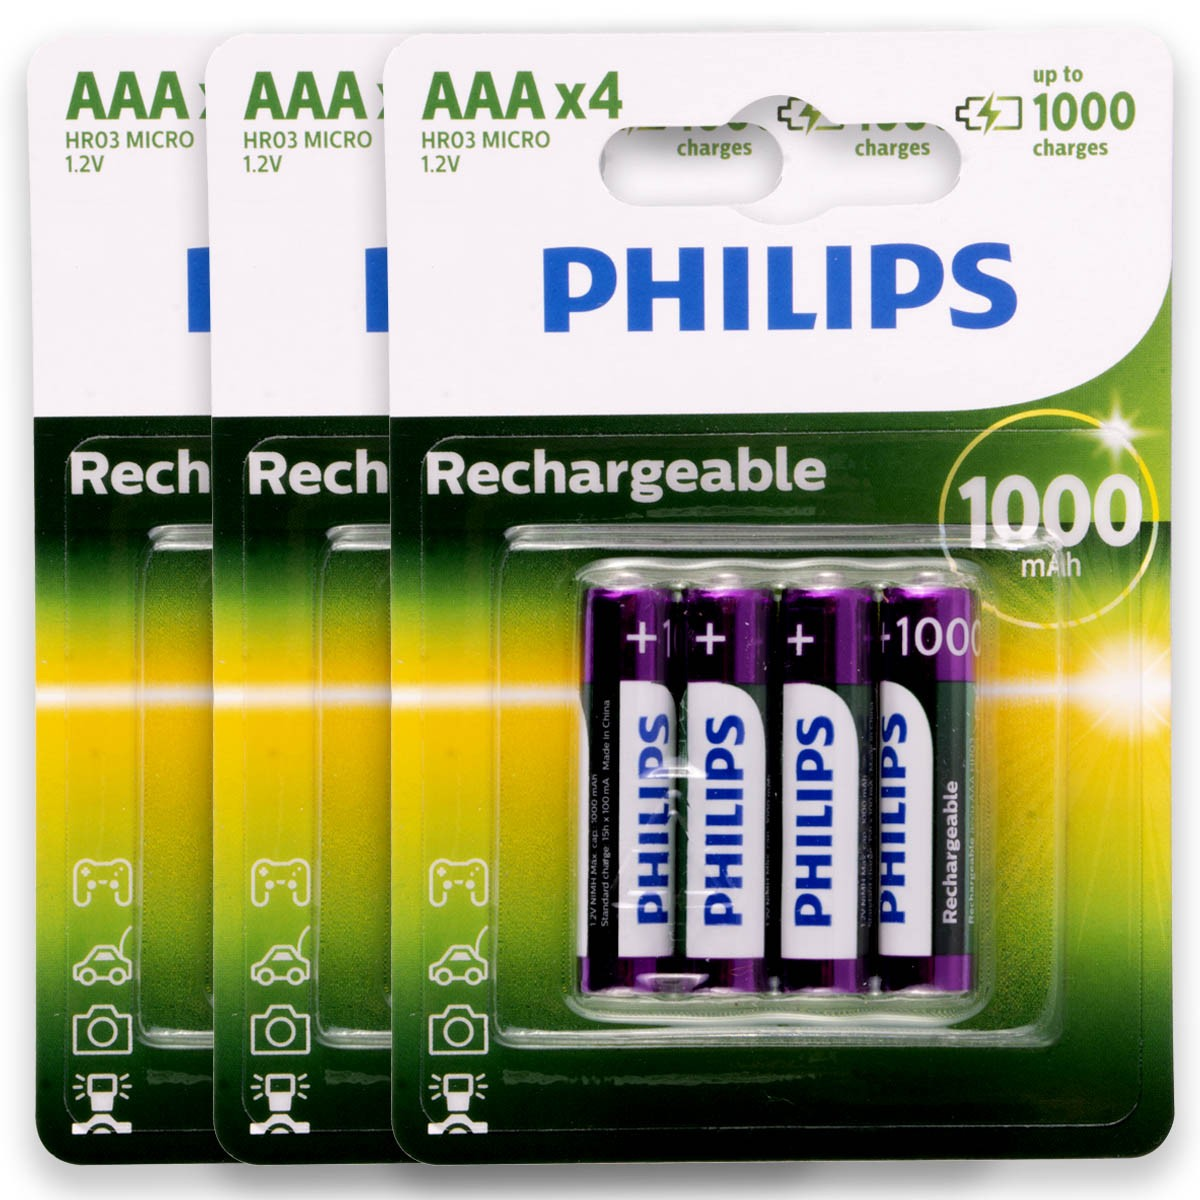 12 Pilhas AAA 1000mAH Recarregável PHILIPS 3 cartelas